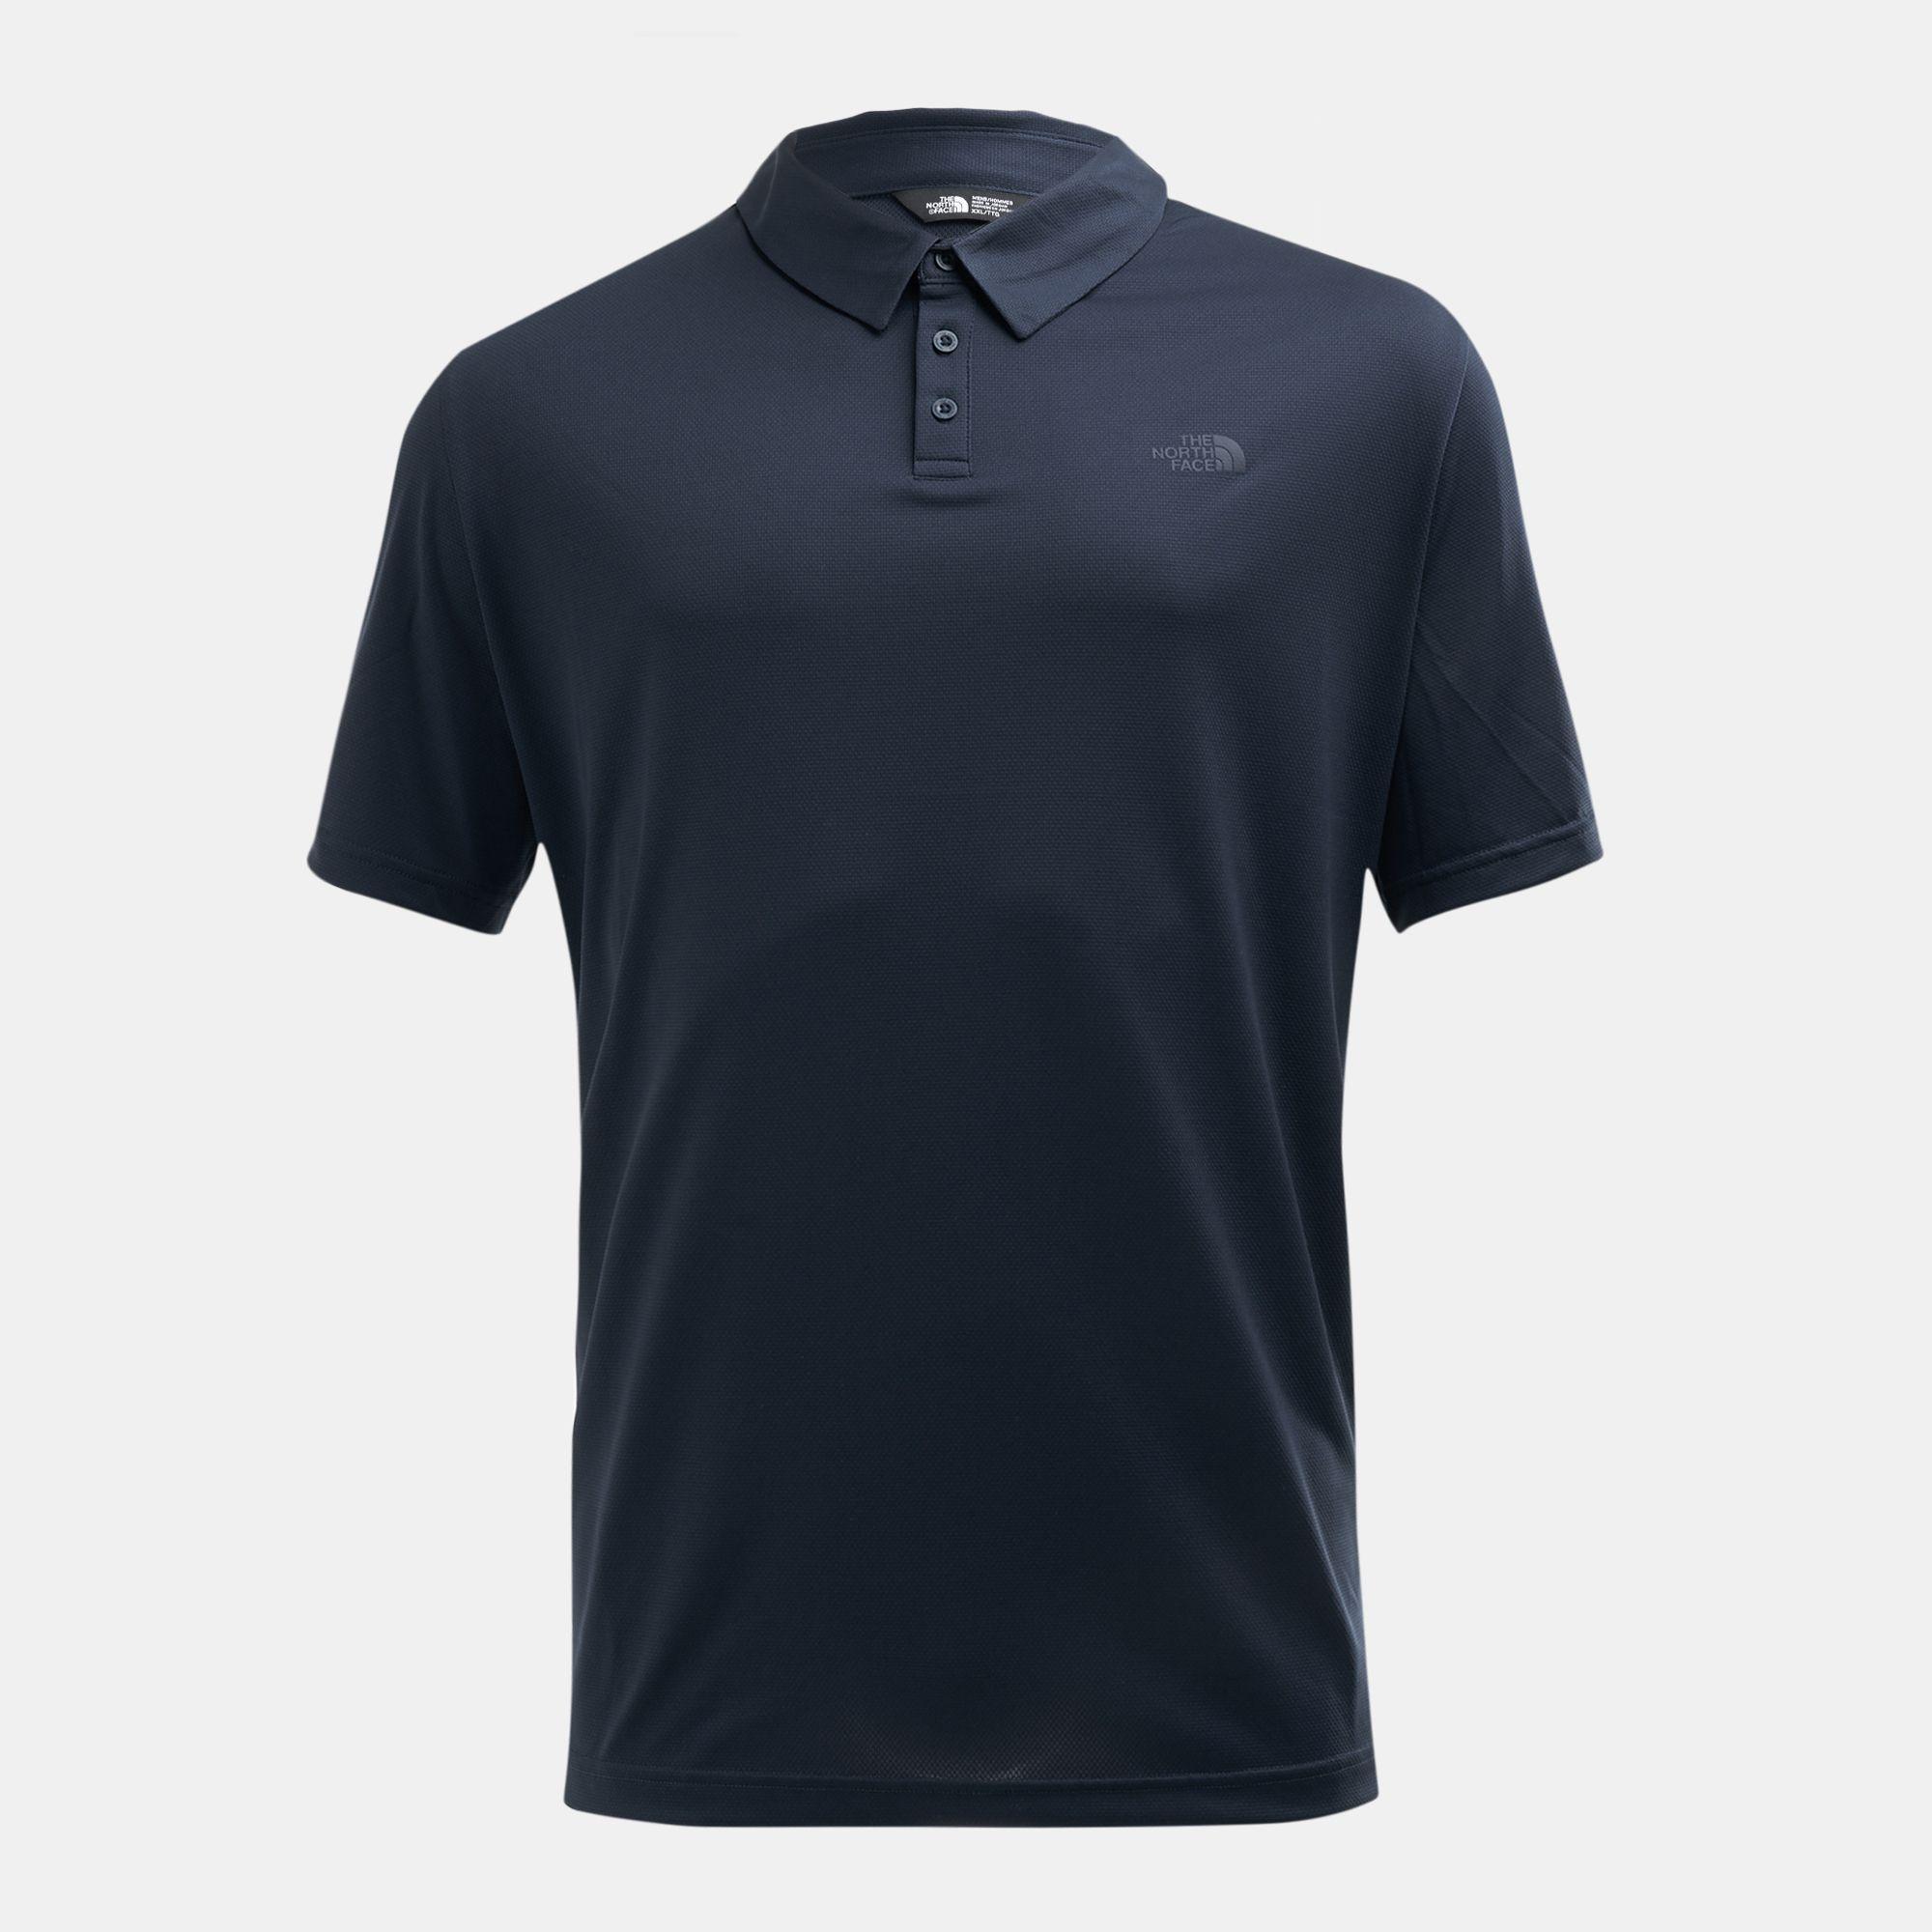 4a6ee329b The North Face Men's Tanken Polo T-Shirt